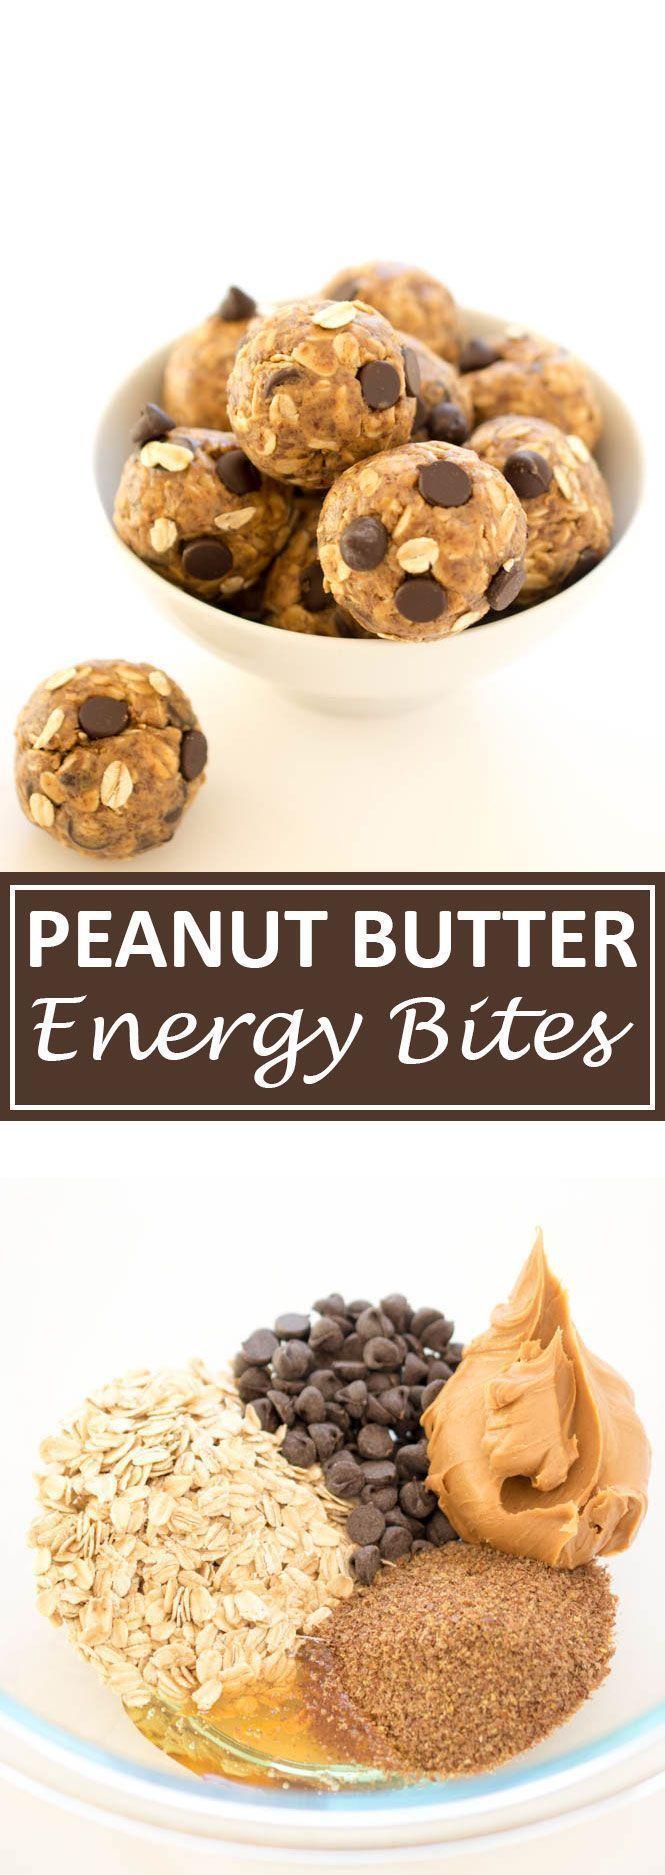 5 Zutaten Erdnussbutter Energy Bites   - Healthy Foodie! - #Bites #Energy #Erdnussbutter #Foodie #Healthy #Zutaten #flaxseedmealrecipes